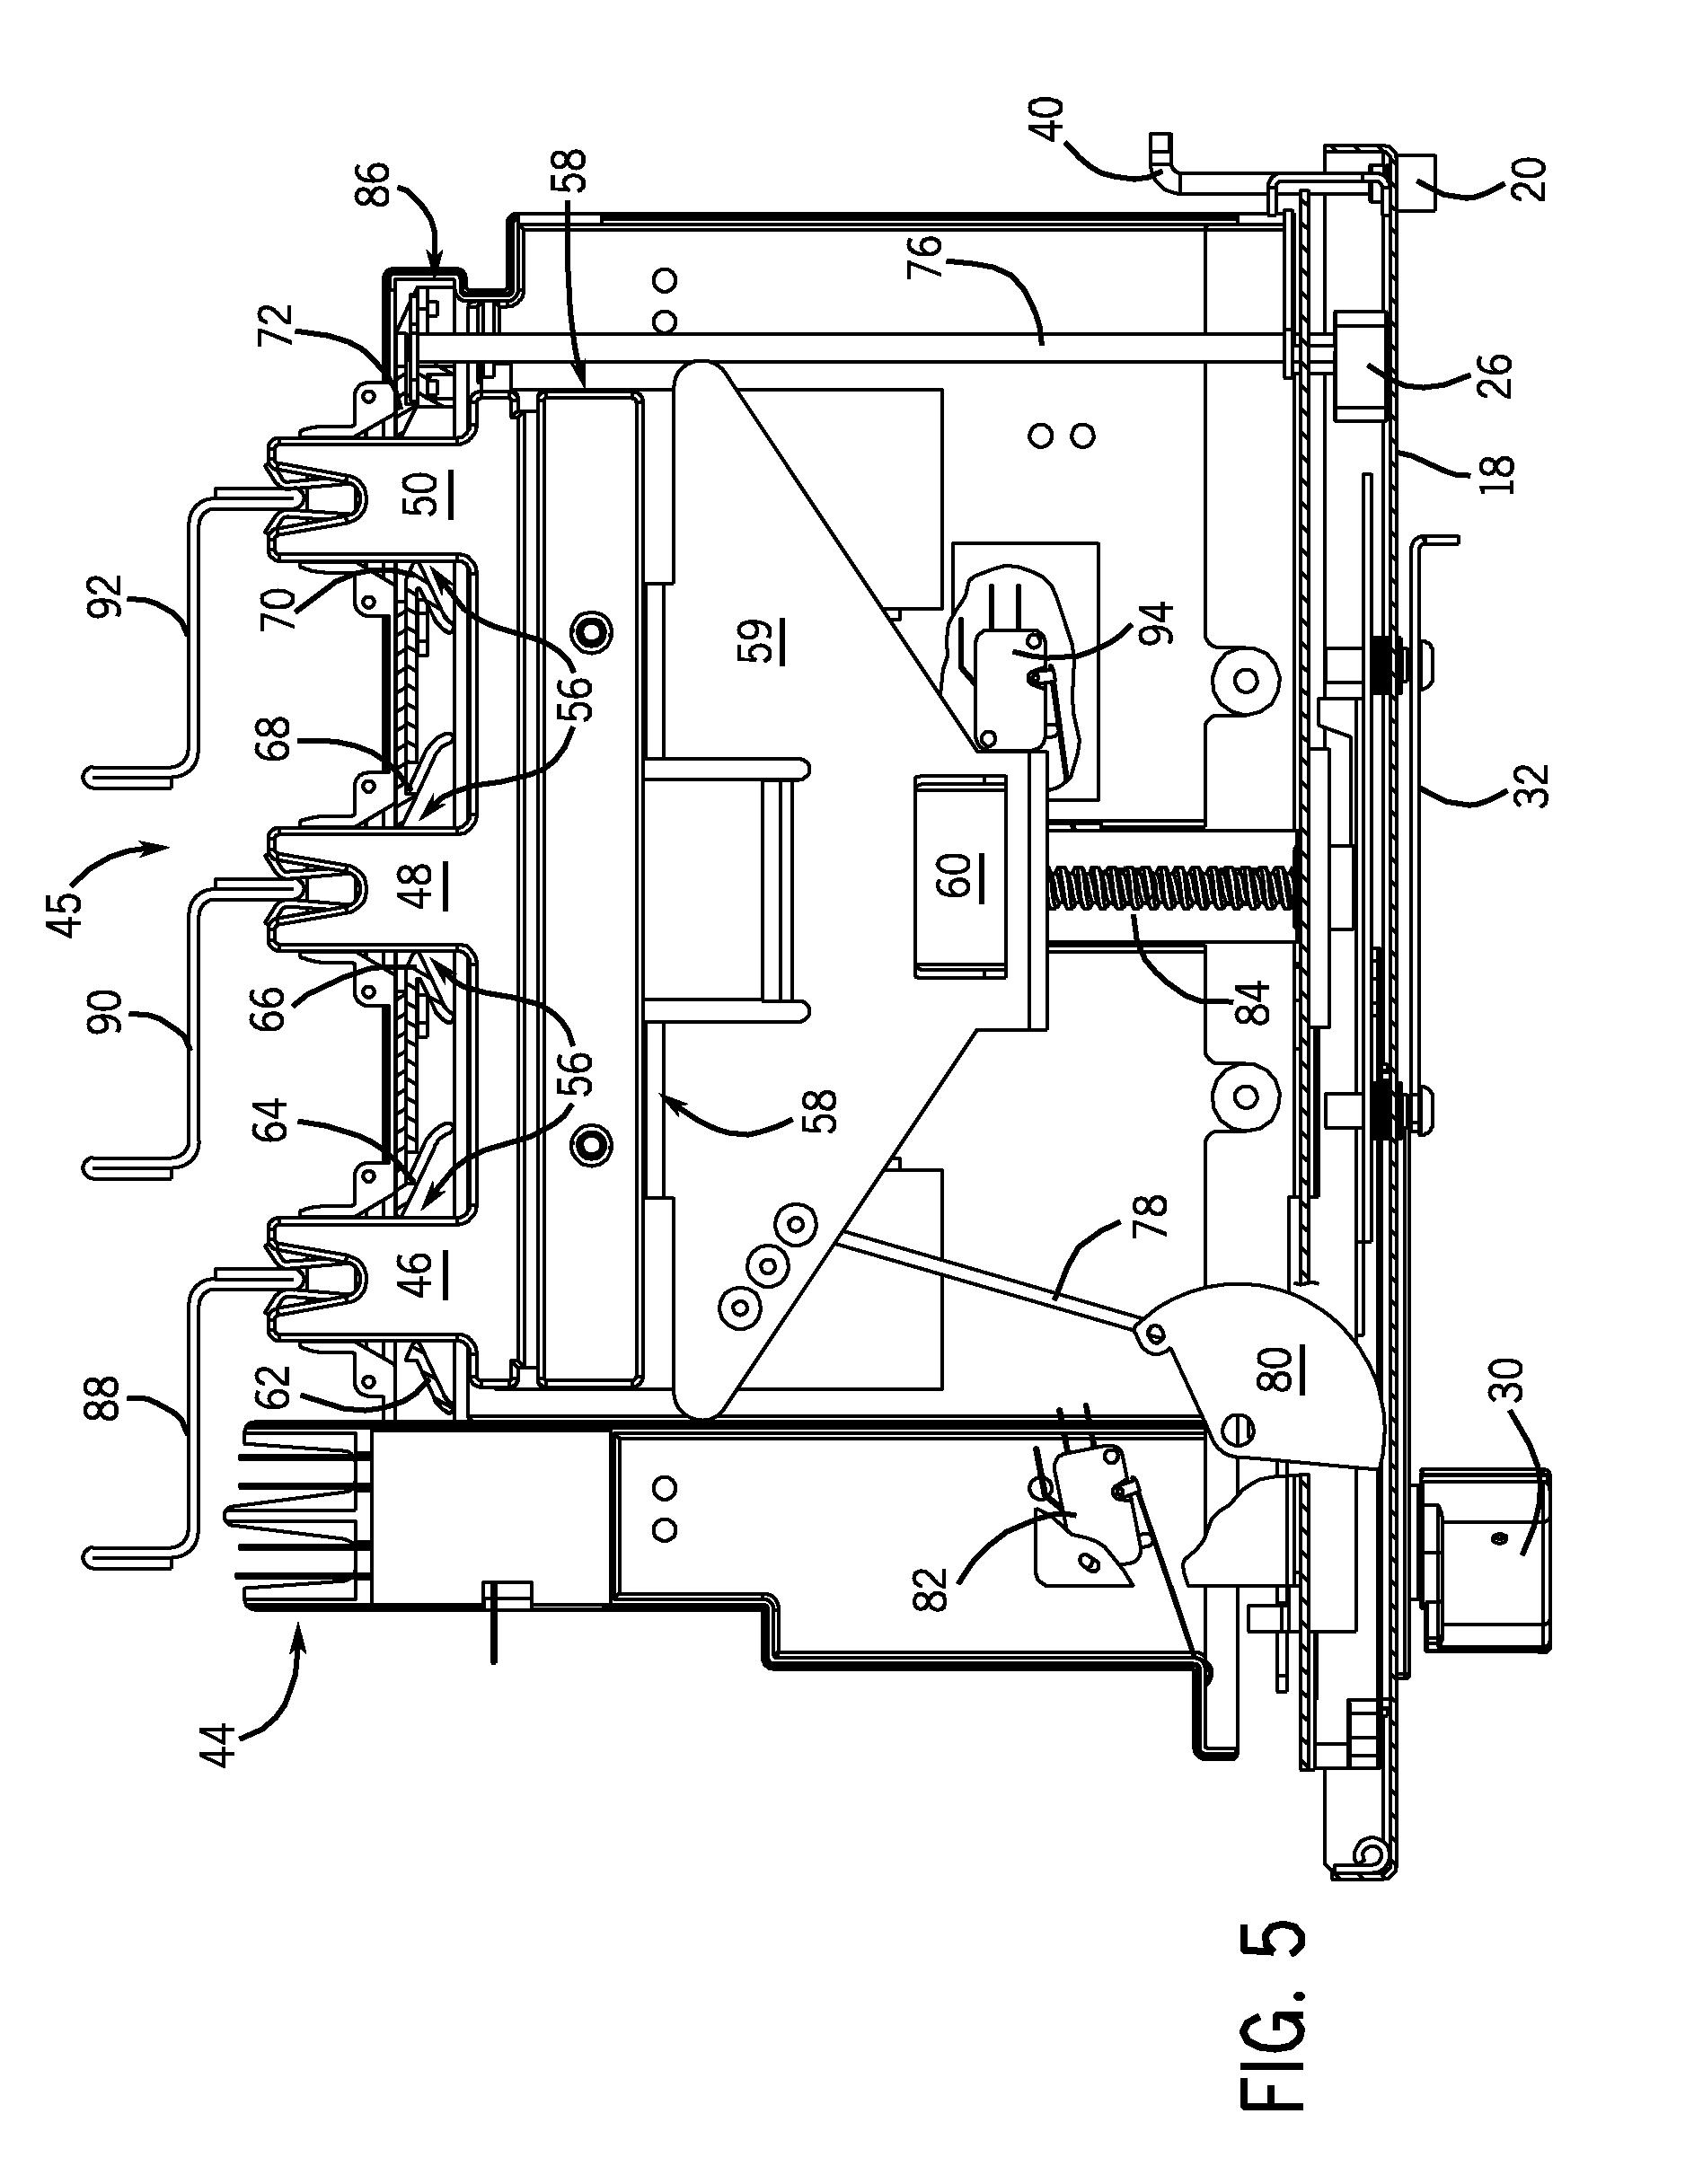 Ge Switchgear Schaltplang Auto Electrical Wiring Diagram